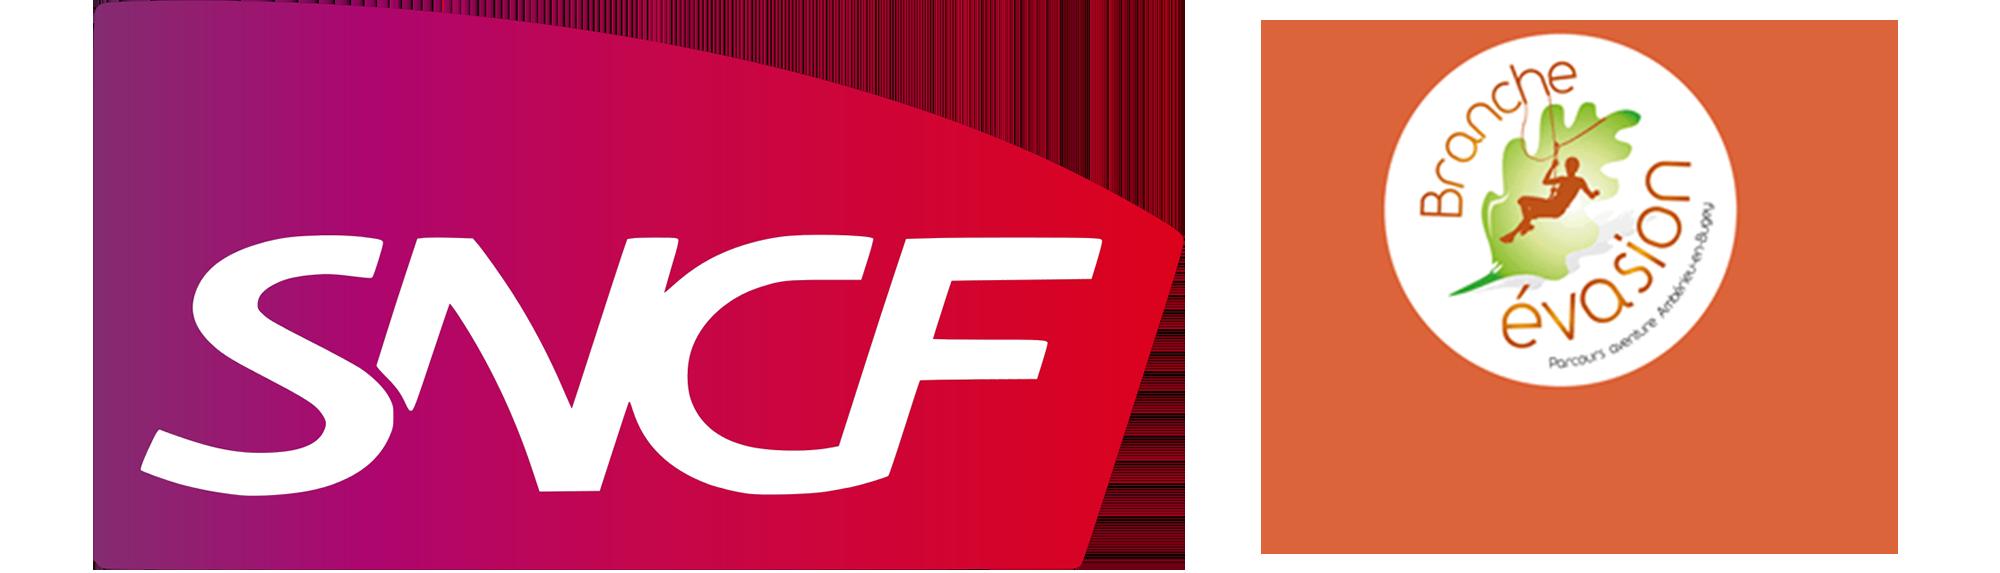 logos-SNCF-branche-evasion